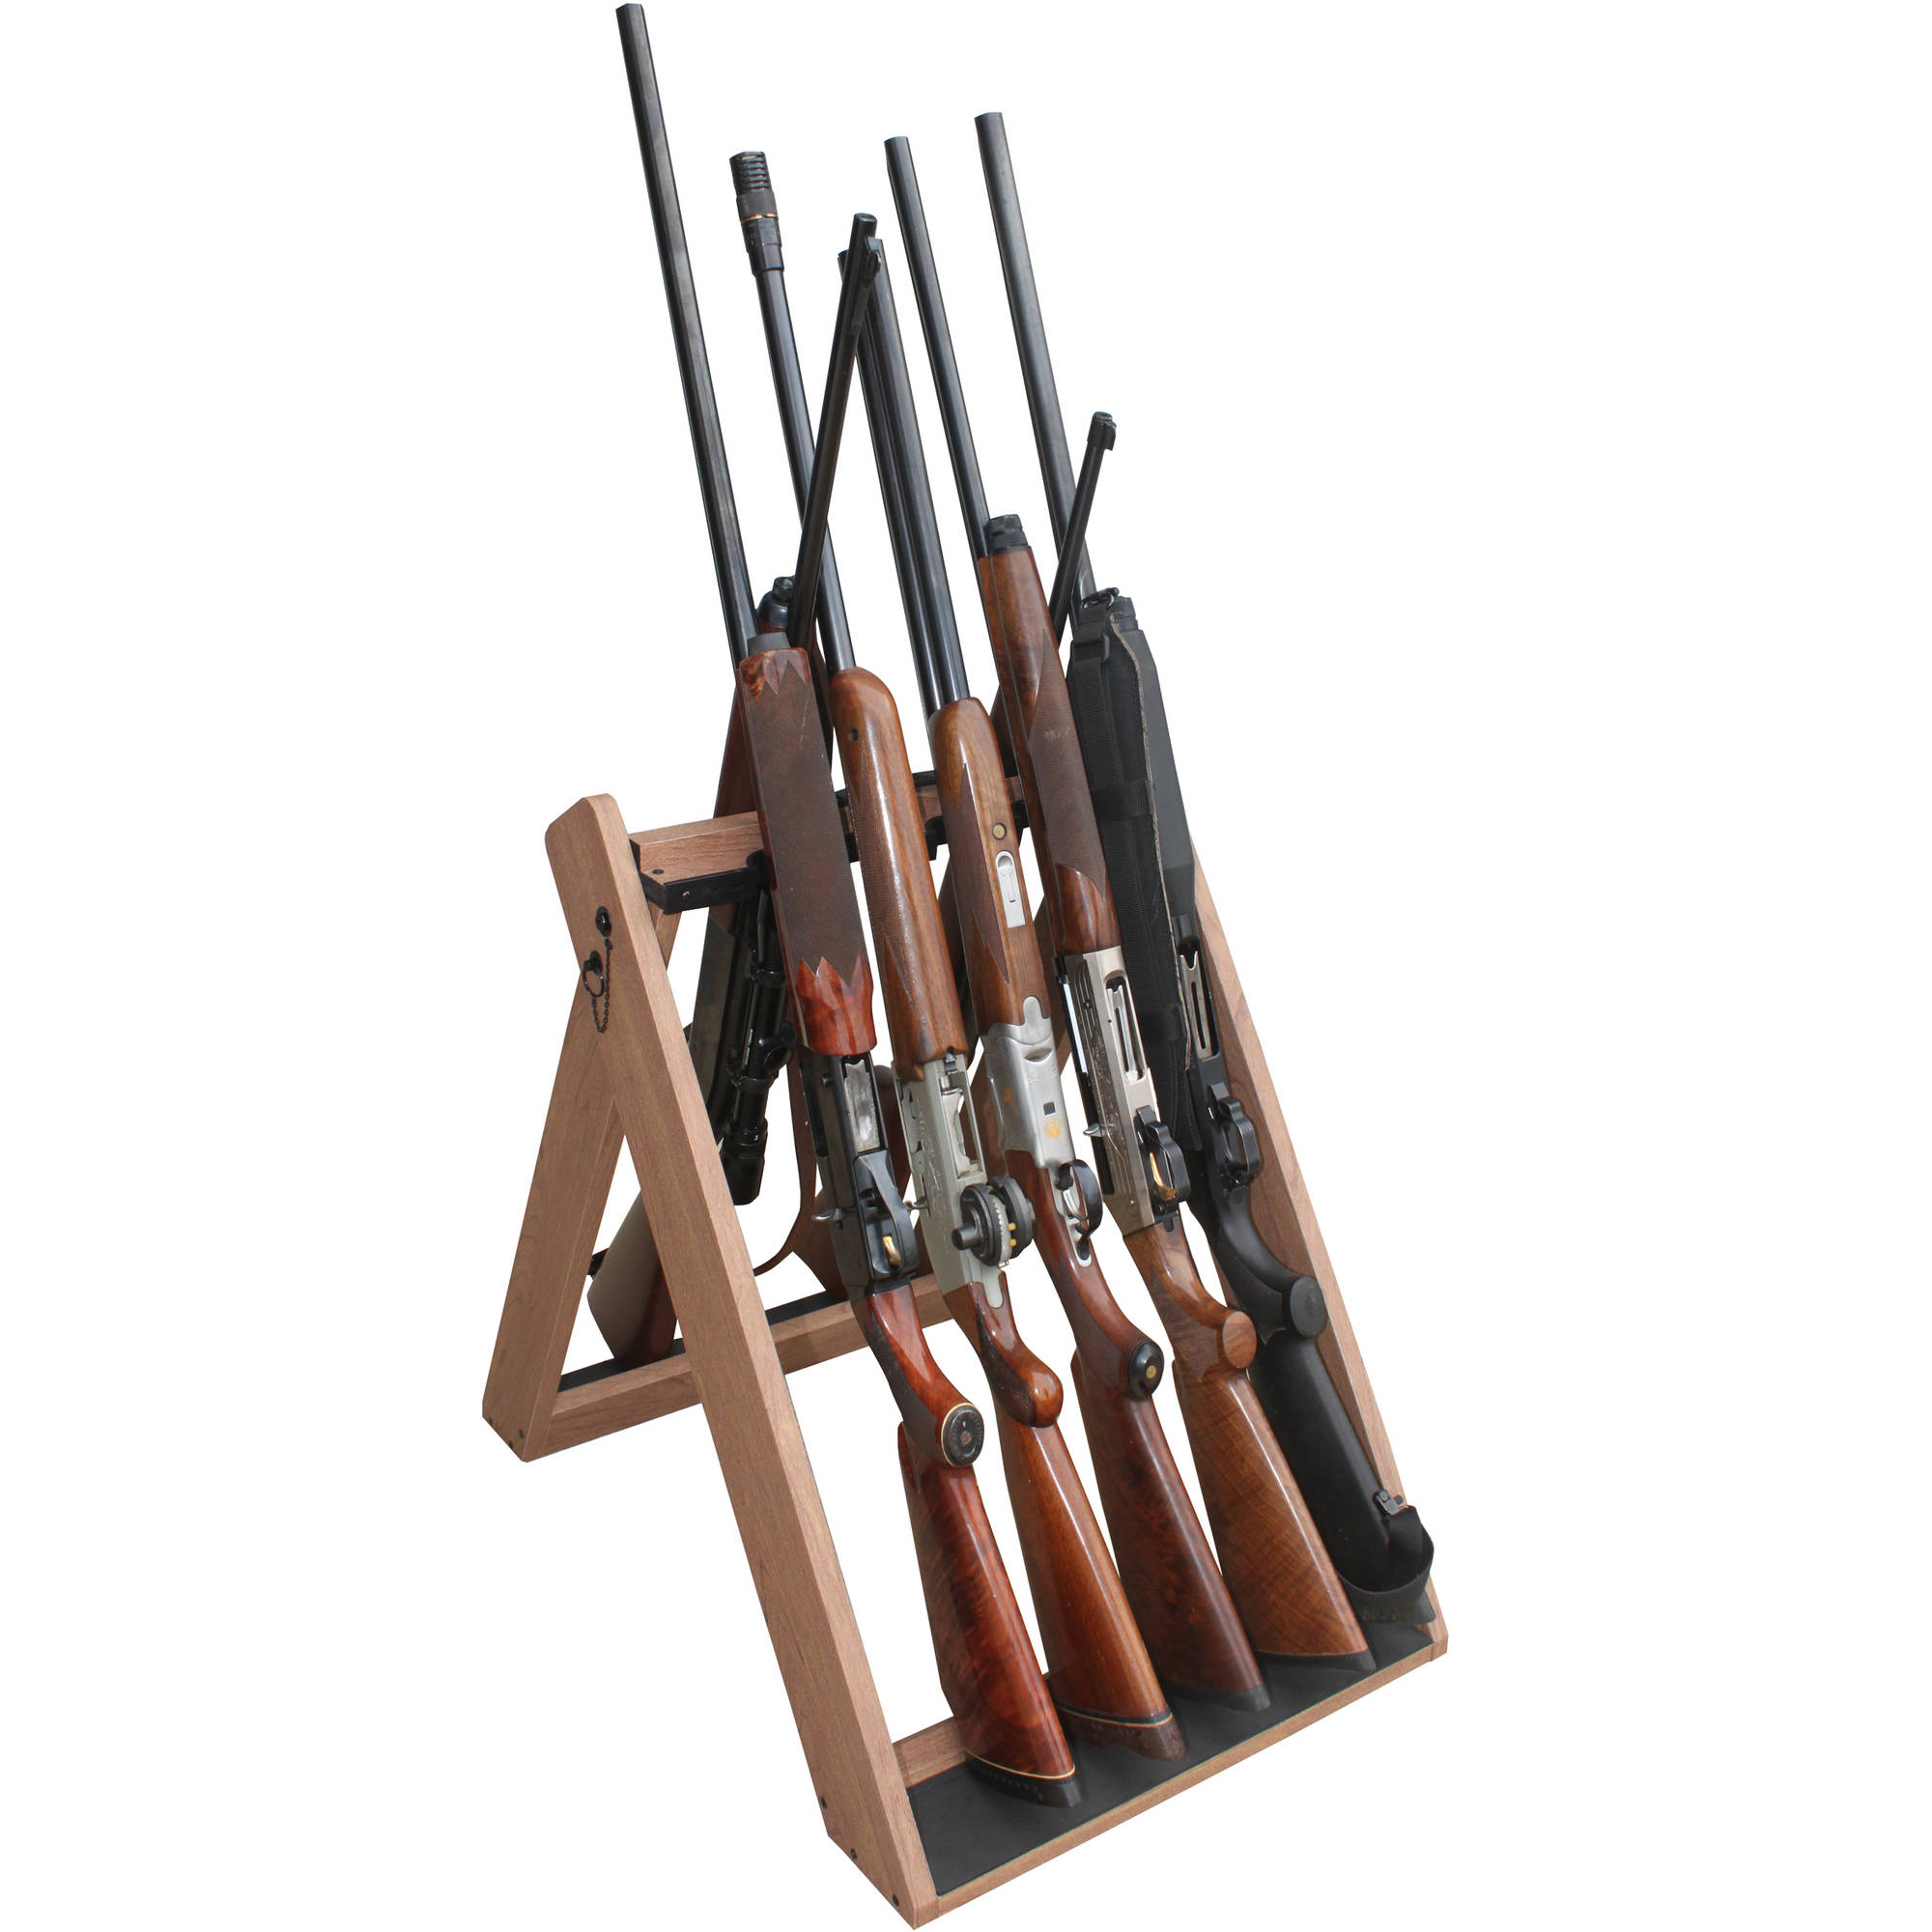 Rush Creek Creations Deer Camp Portable 10 Gun Folding Storage Rack